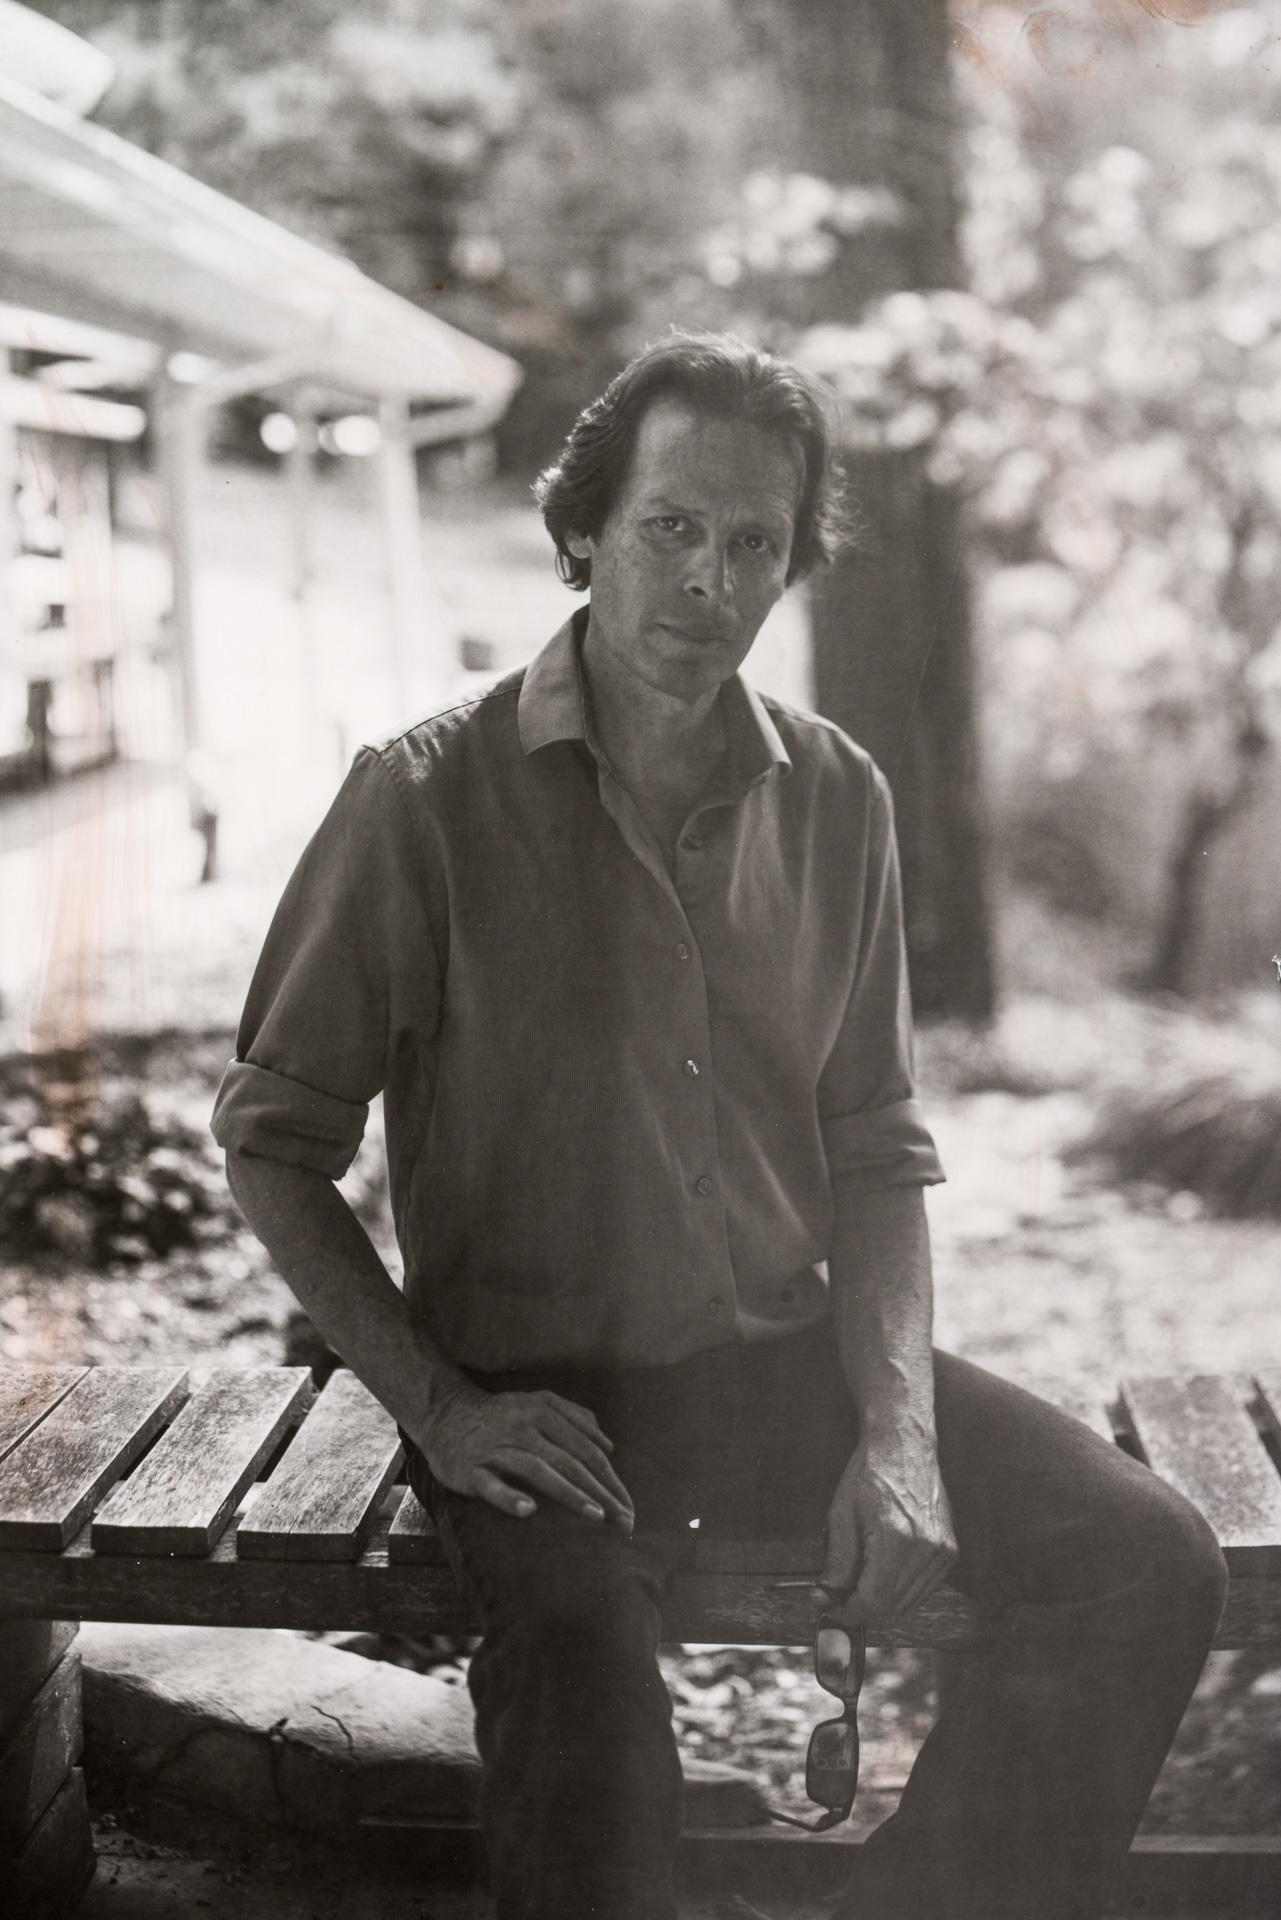 Portrait of daguerreotypist / photographic artist Jerry Spagnoli at Penland School of Craft in Asheville, North Carolina. Photo ©2015 Stephen Takacs